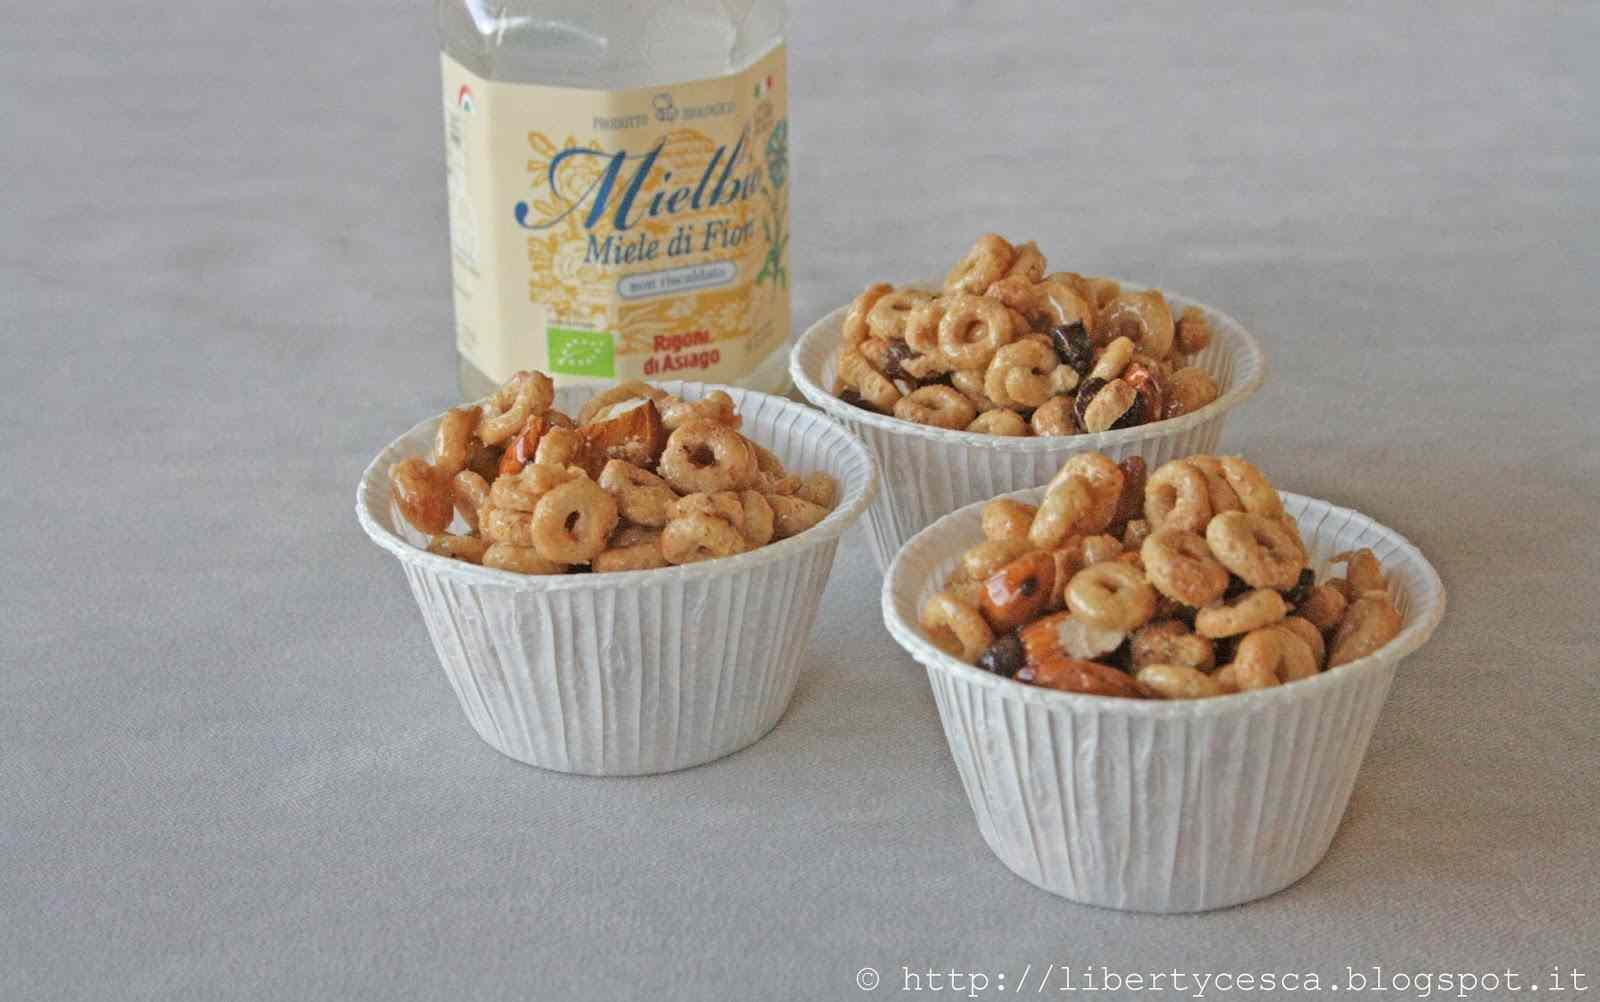 Ricetta: No-bake honey almond cereal balls / palline con mandorle miele e cereali